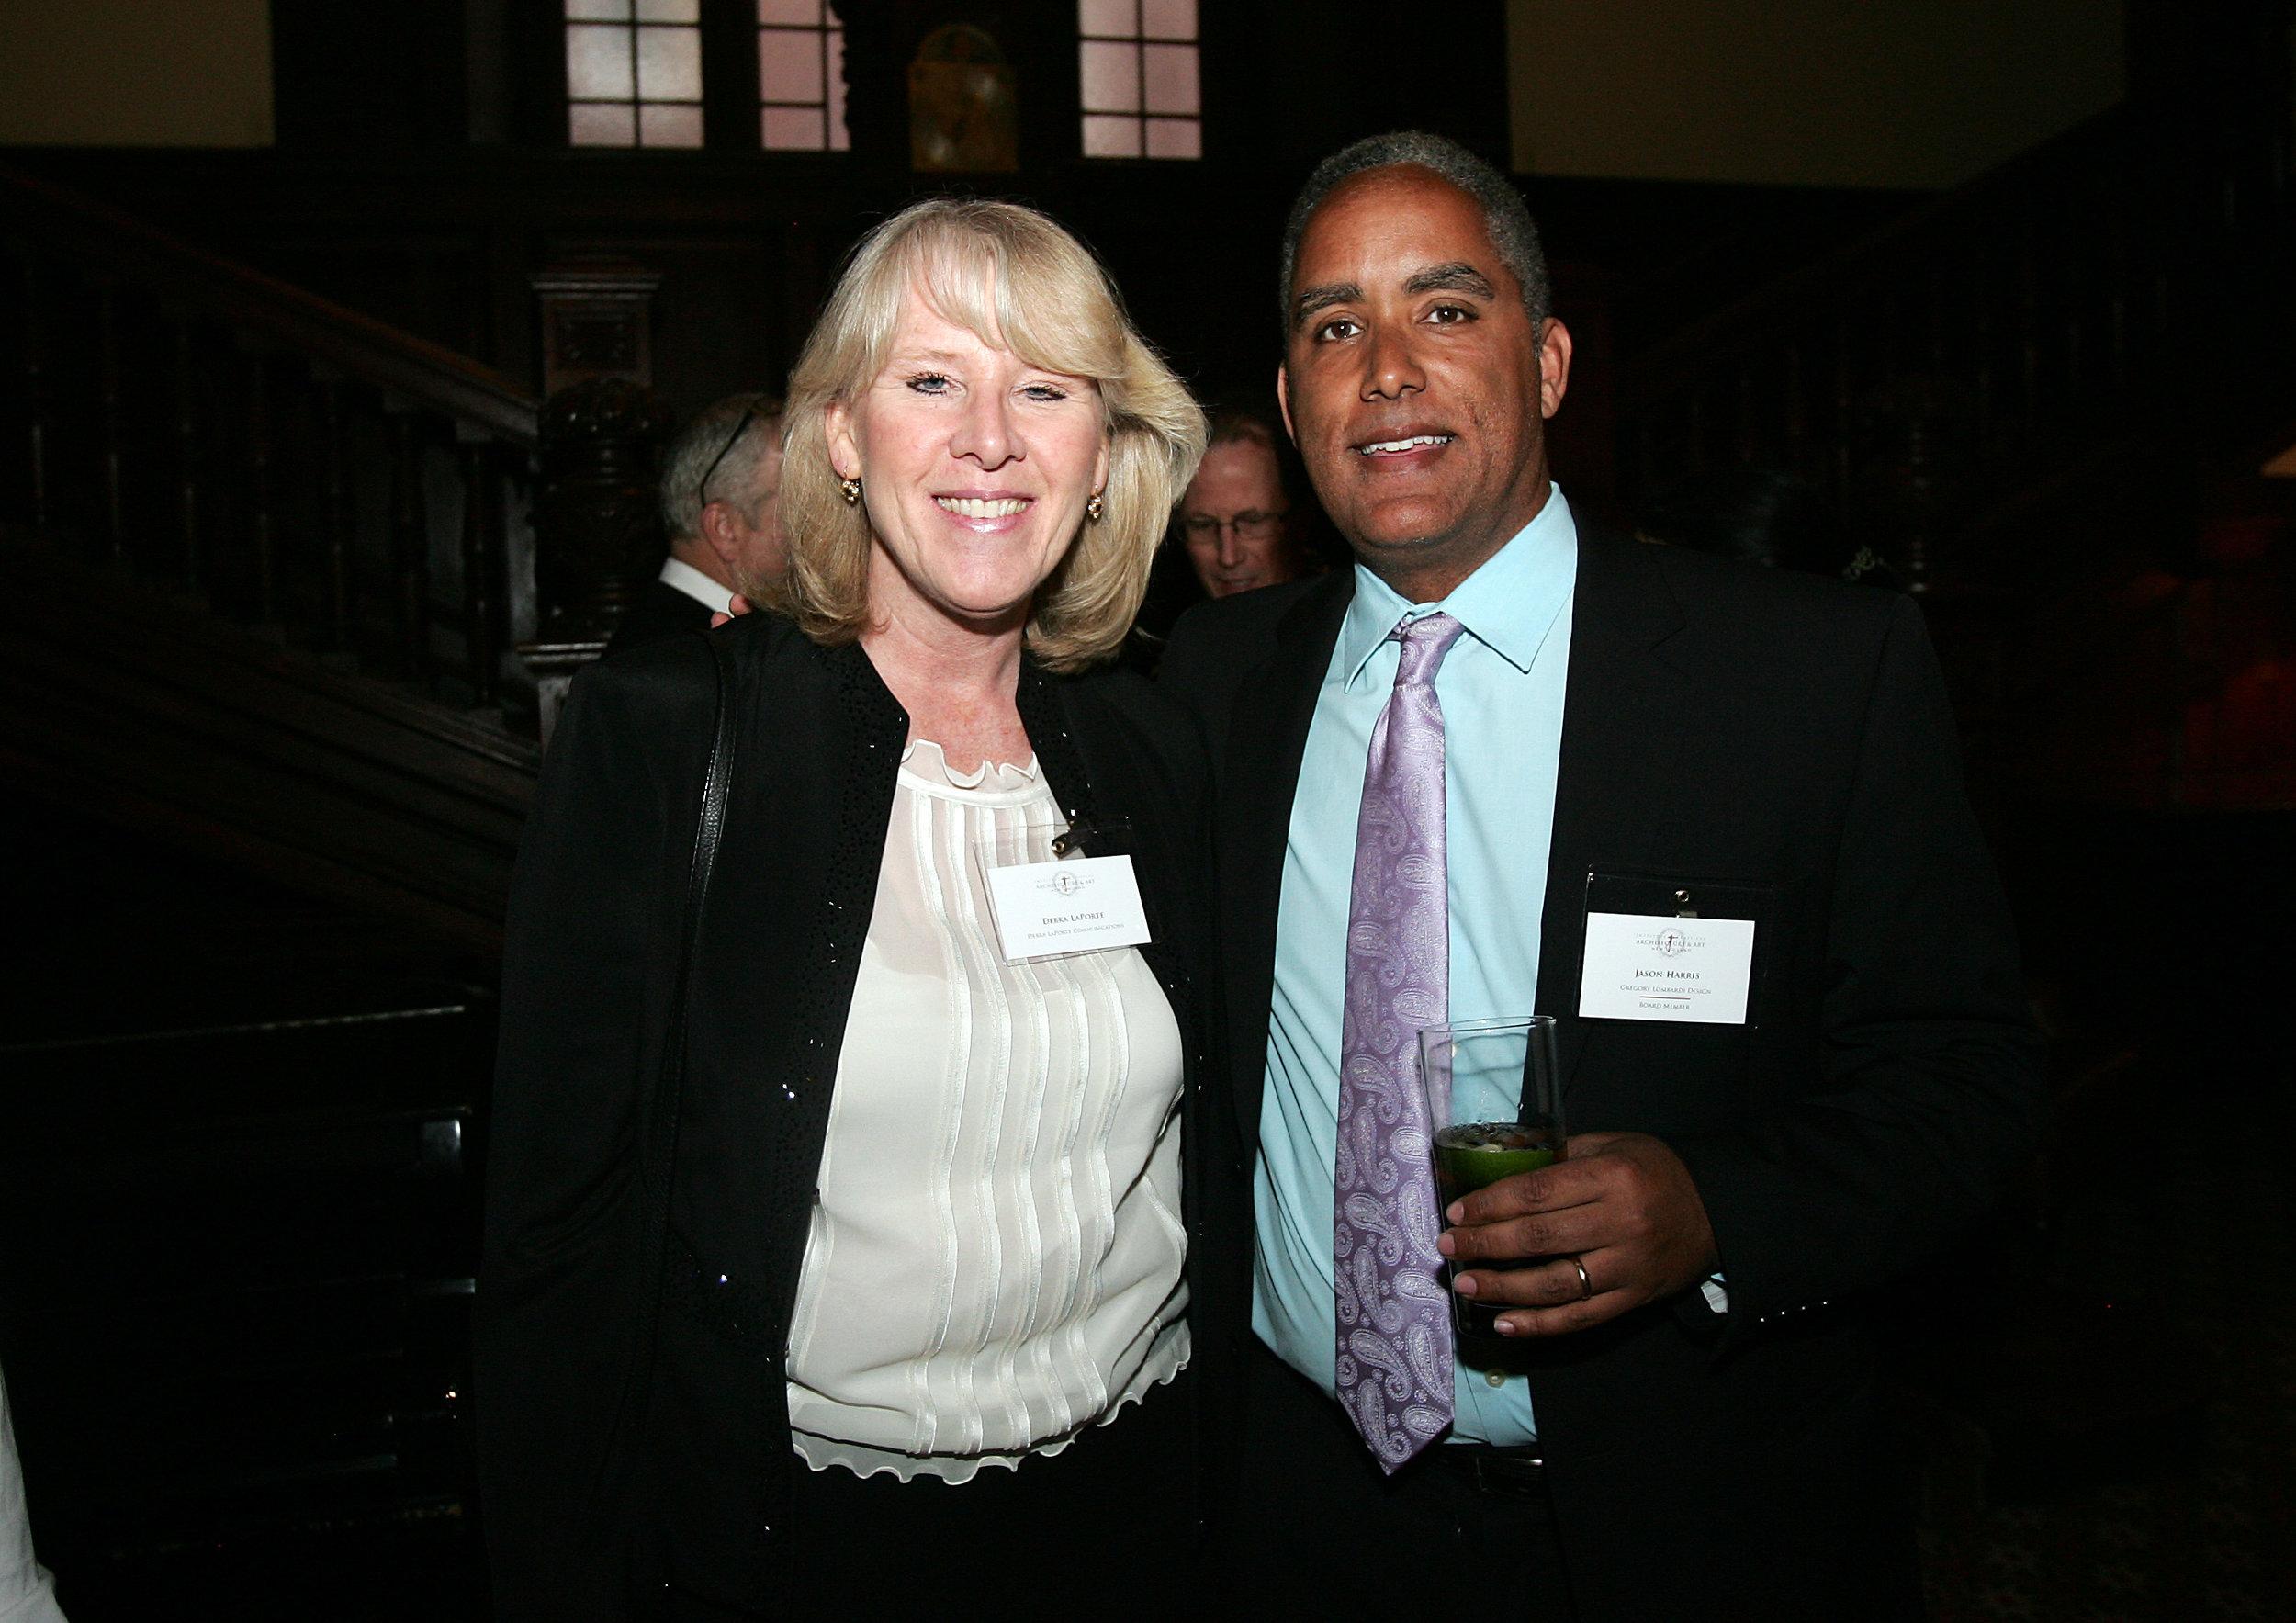 Debra LaPorte, Chapter Treasurer Jason Harris